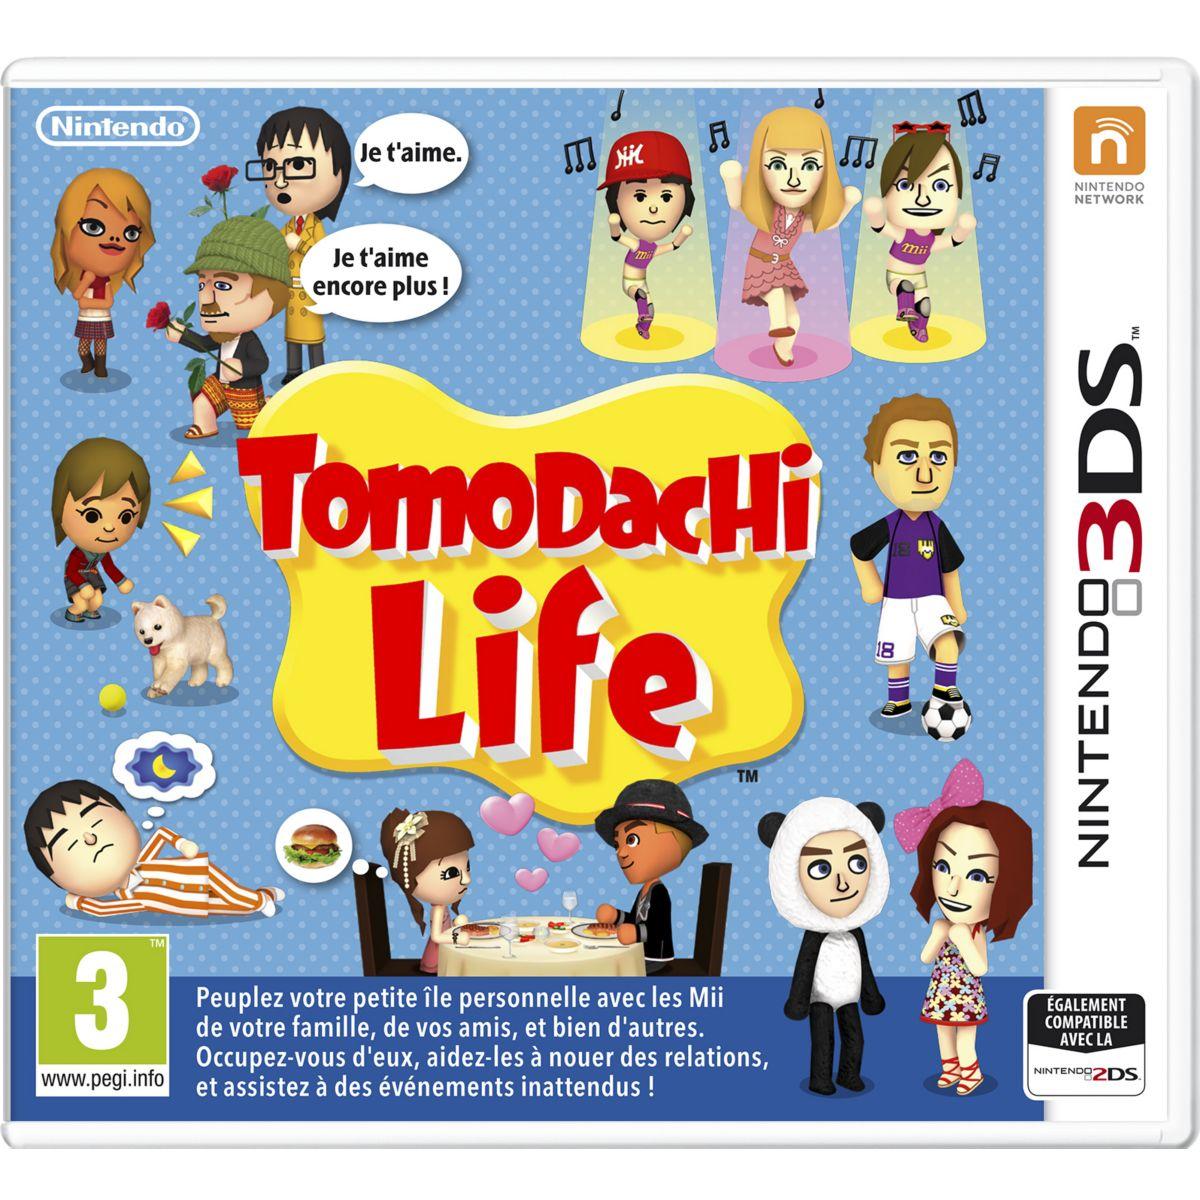 Jeu 3DS NINTENDO Tomodachi Life (photo)